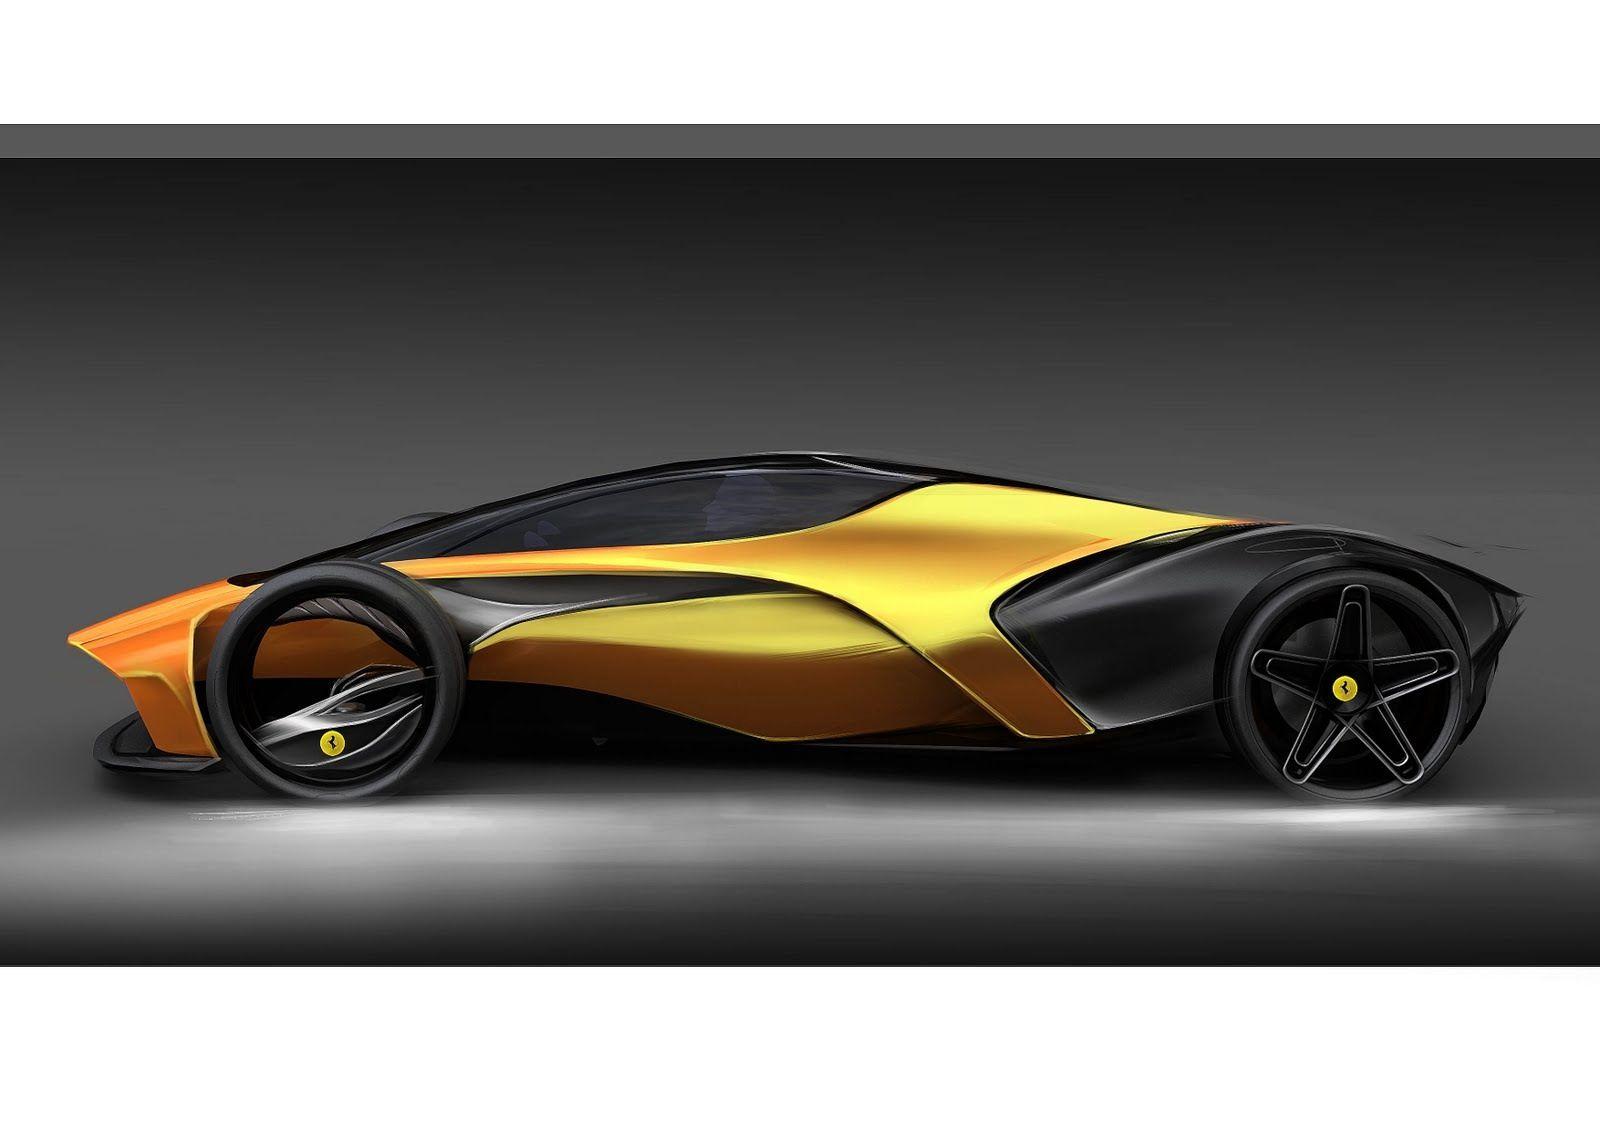 Fast Cars Concept Cars Futuristic Cars Design Future Concept Cars